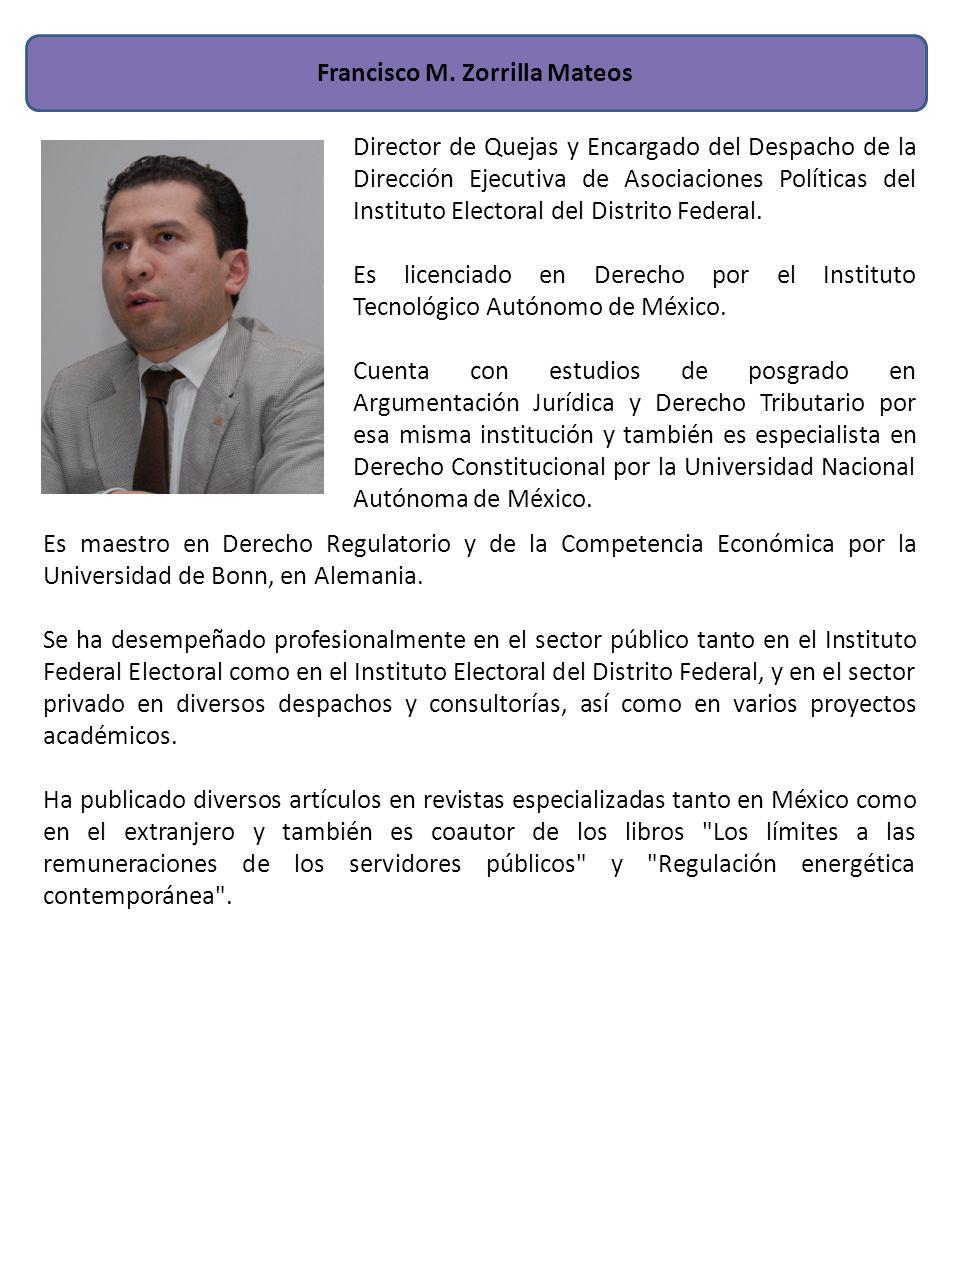 Francisco M. Zorrilla Mateos